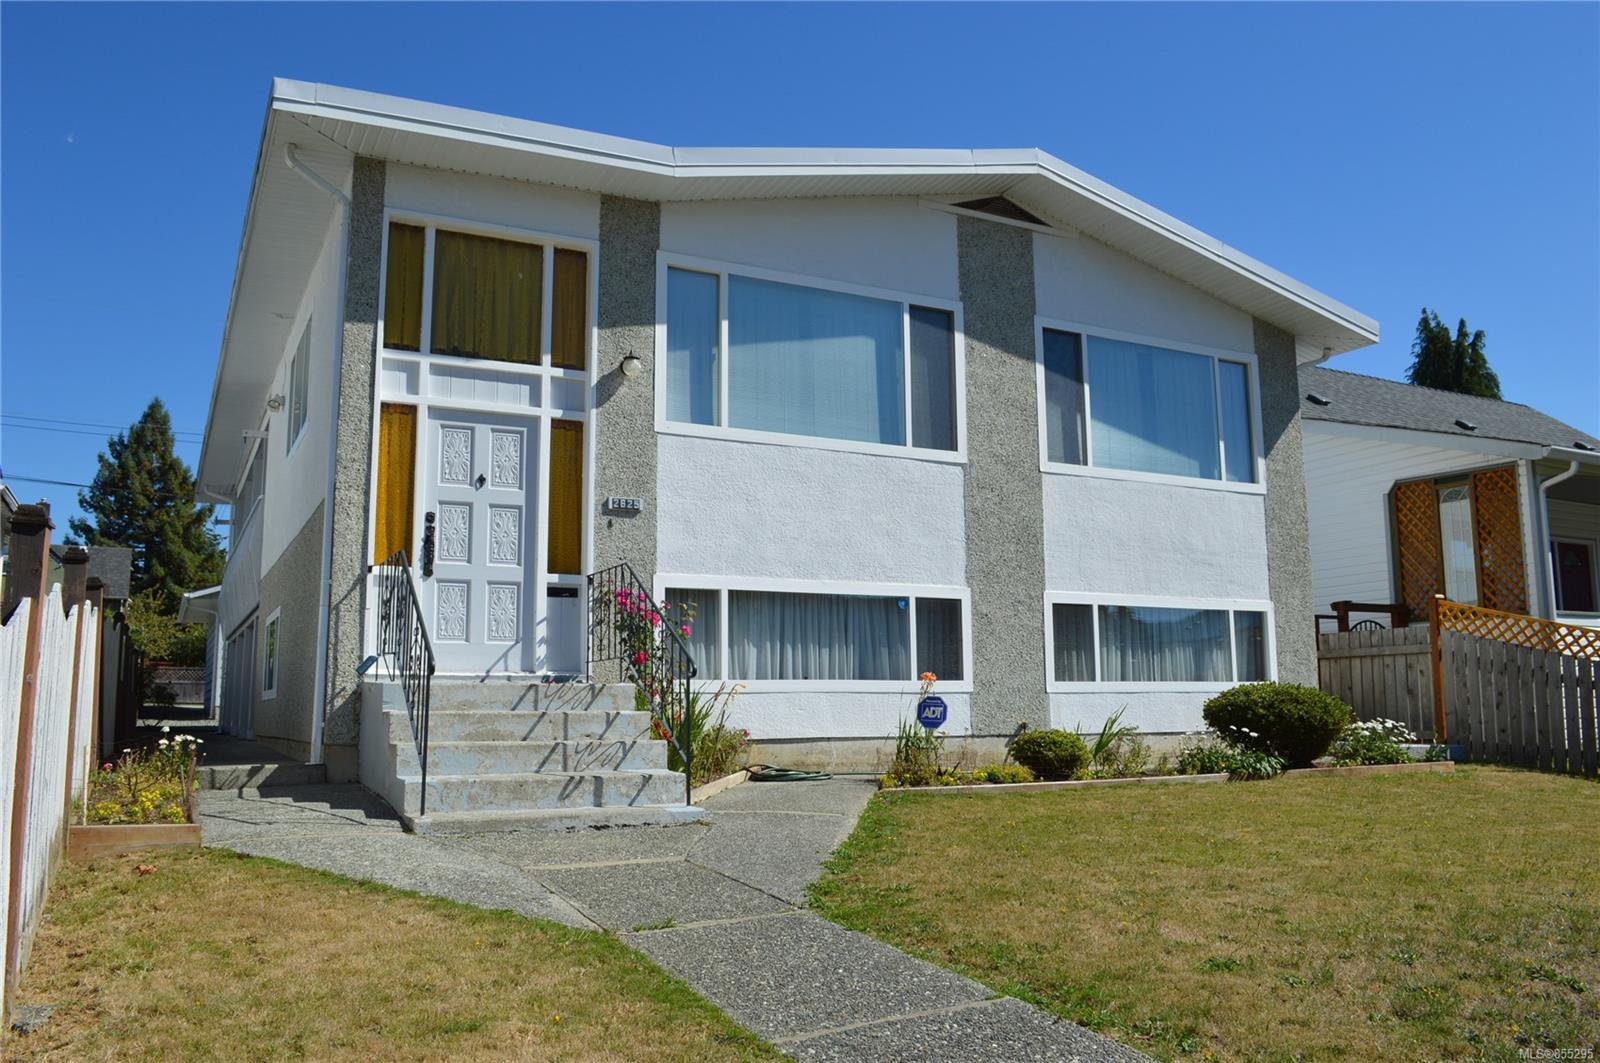 Main Photo: 2625 7th Ave in : PA Port Alberni House for sale (Port Alberni)  : MLS®# 855295